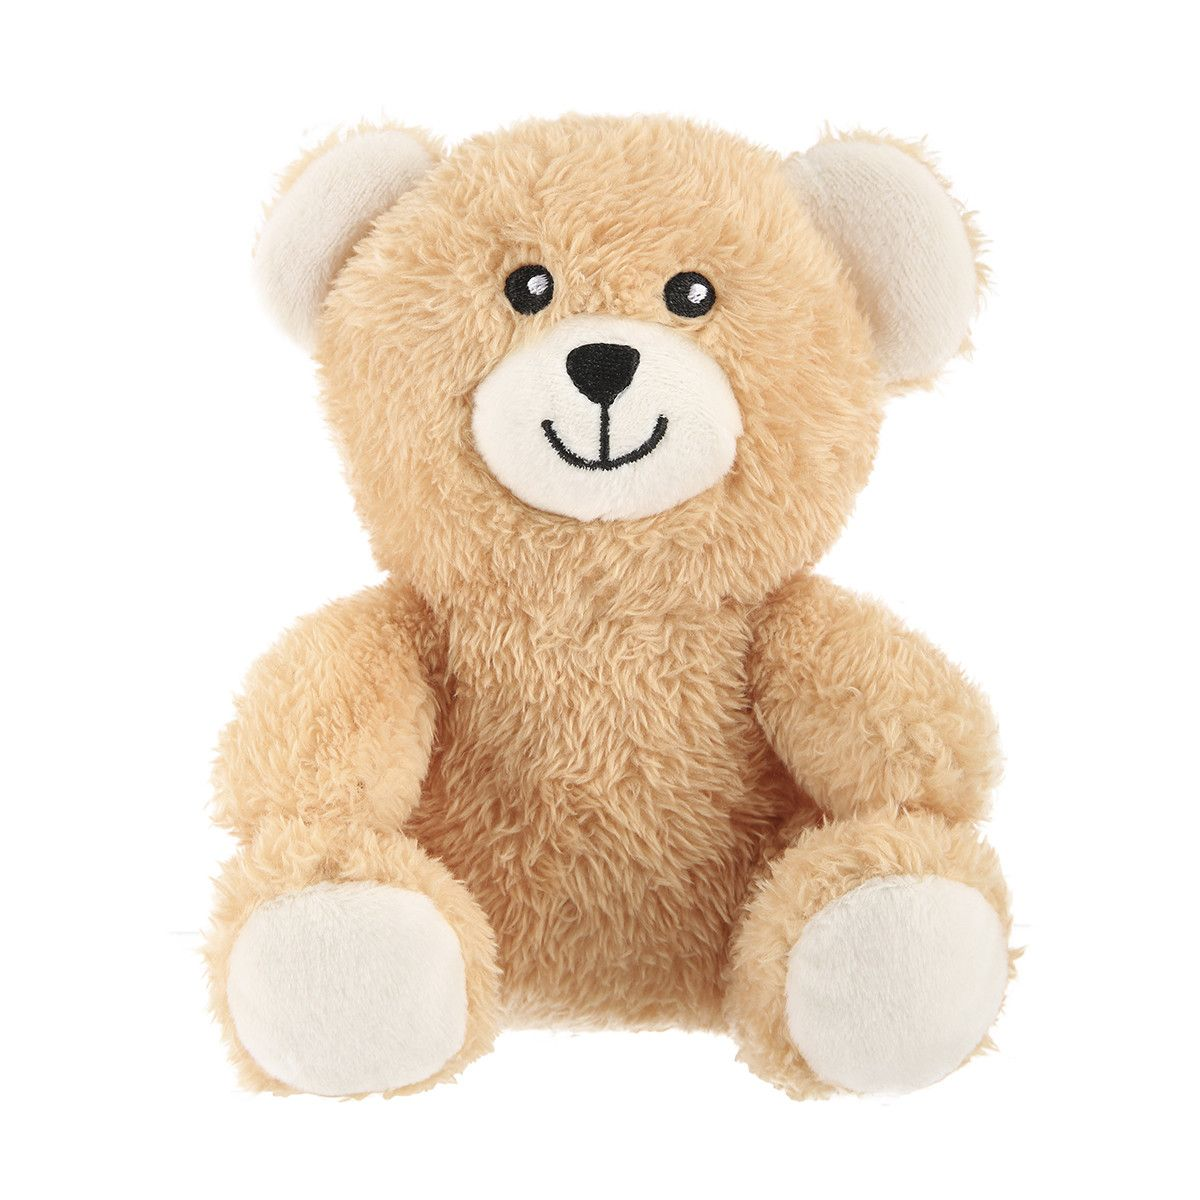 Plush Bear Puppy Toy Kmart Bear puppy, Toy puppies